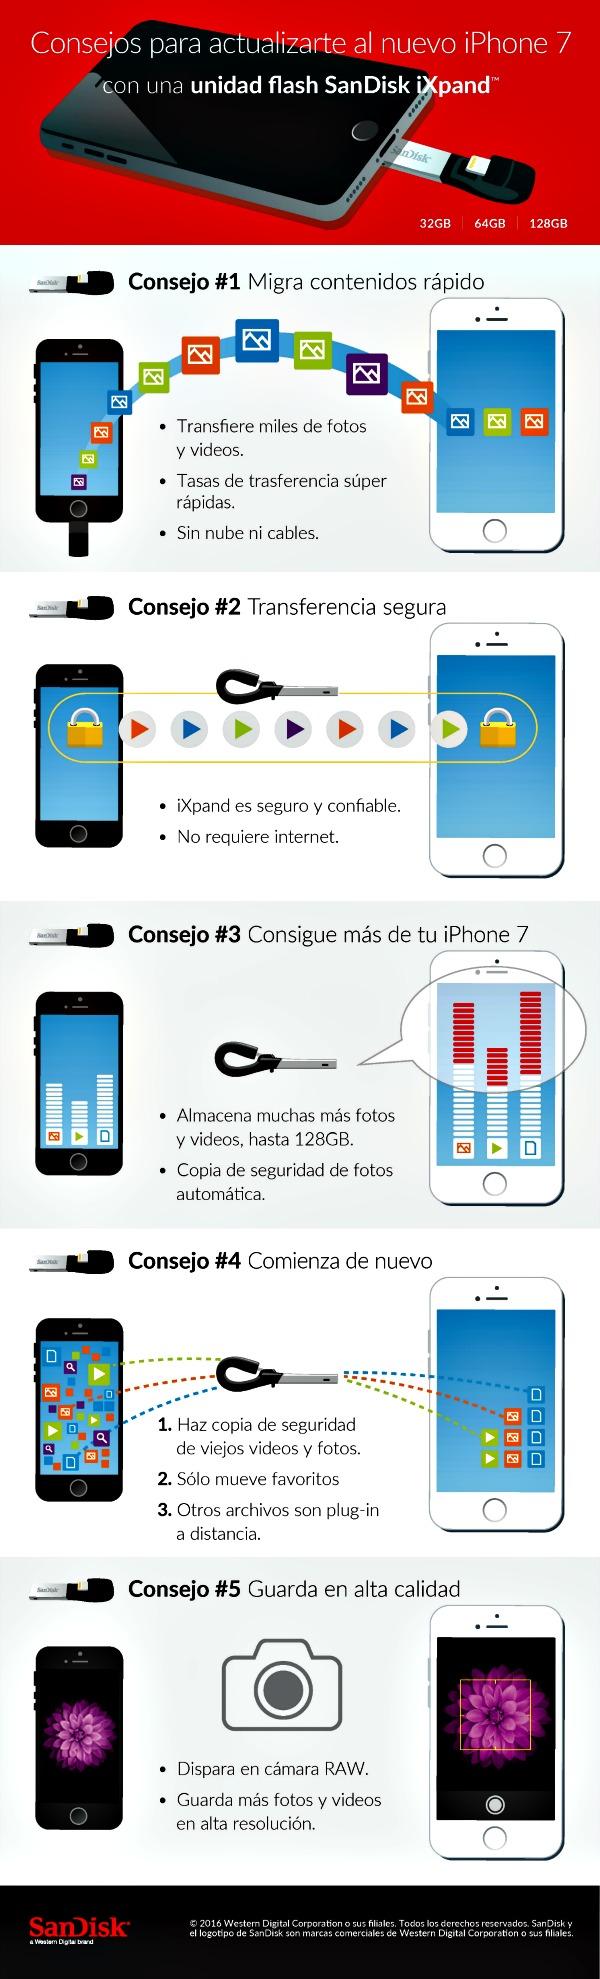 SanDisk_iXpand_Infografia_iPhone7_ESP